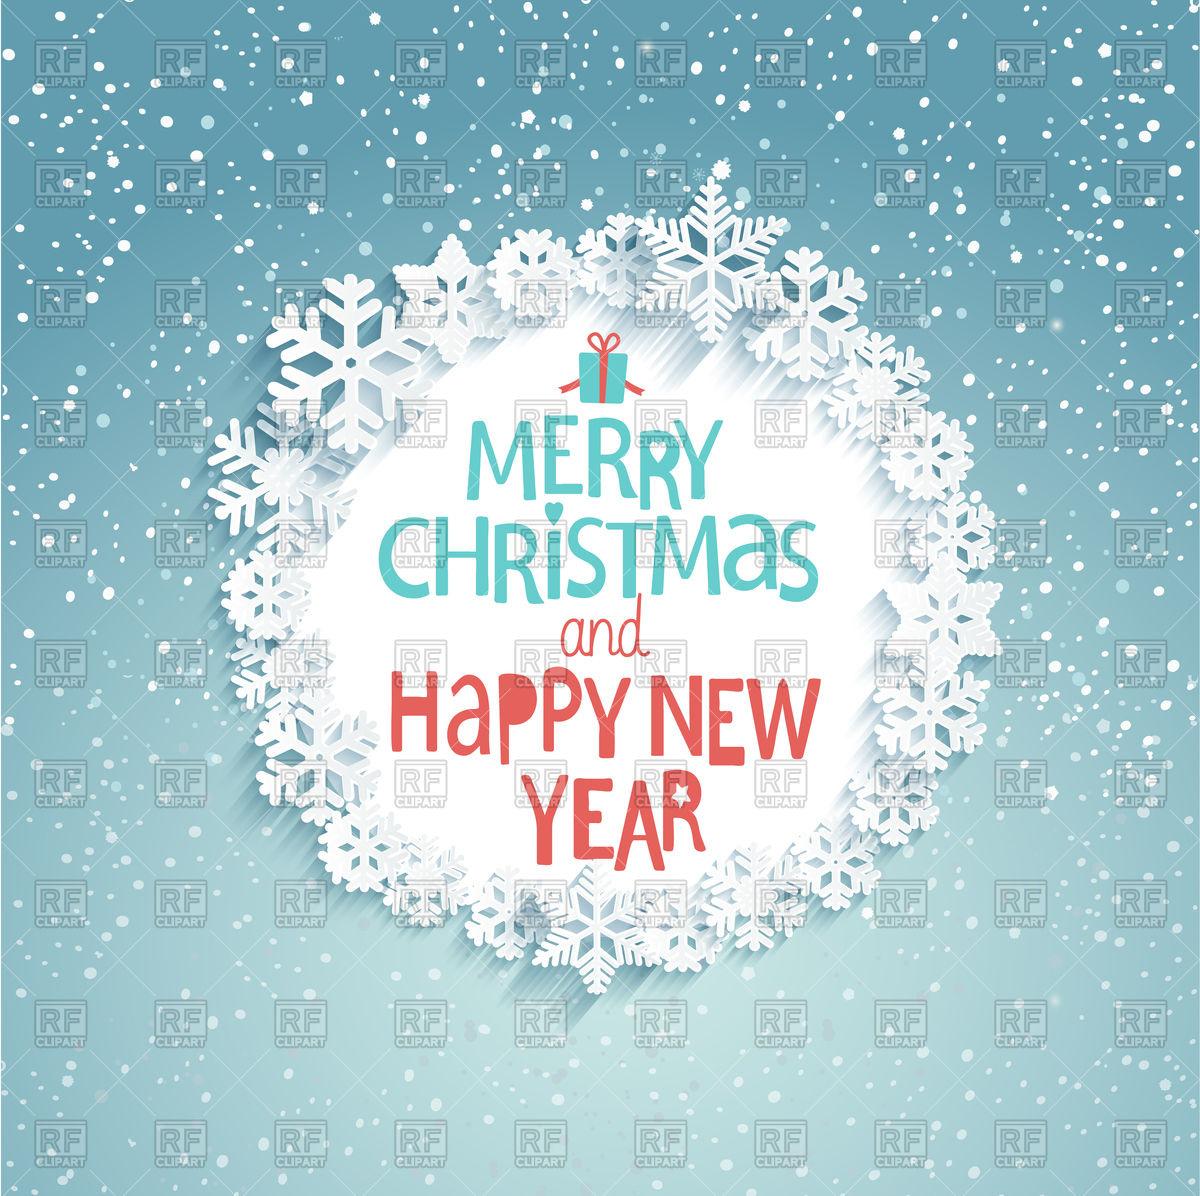 1200x1196 Christmas Greeting Card With Snowfall Vector Image Vector